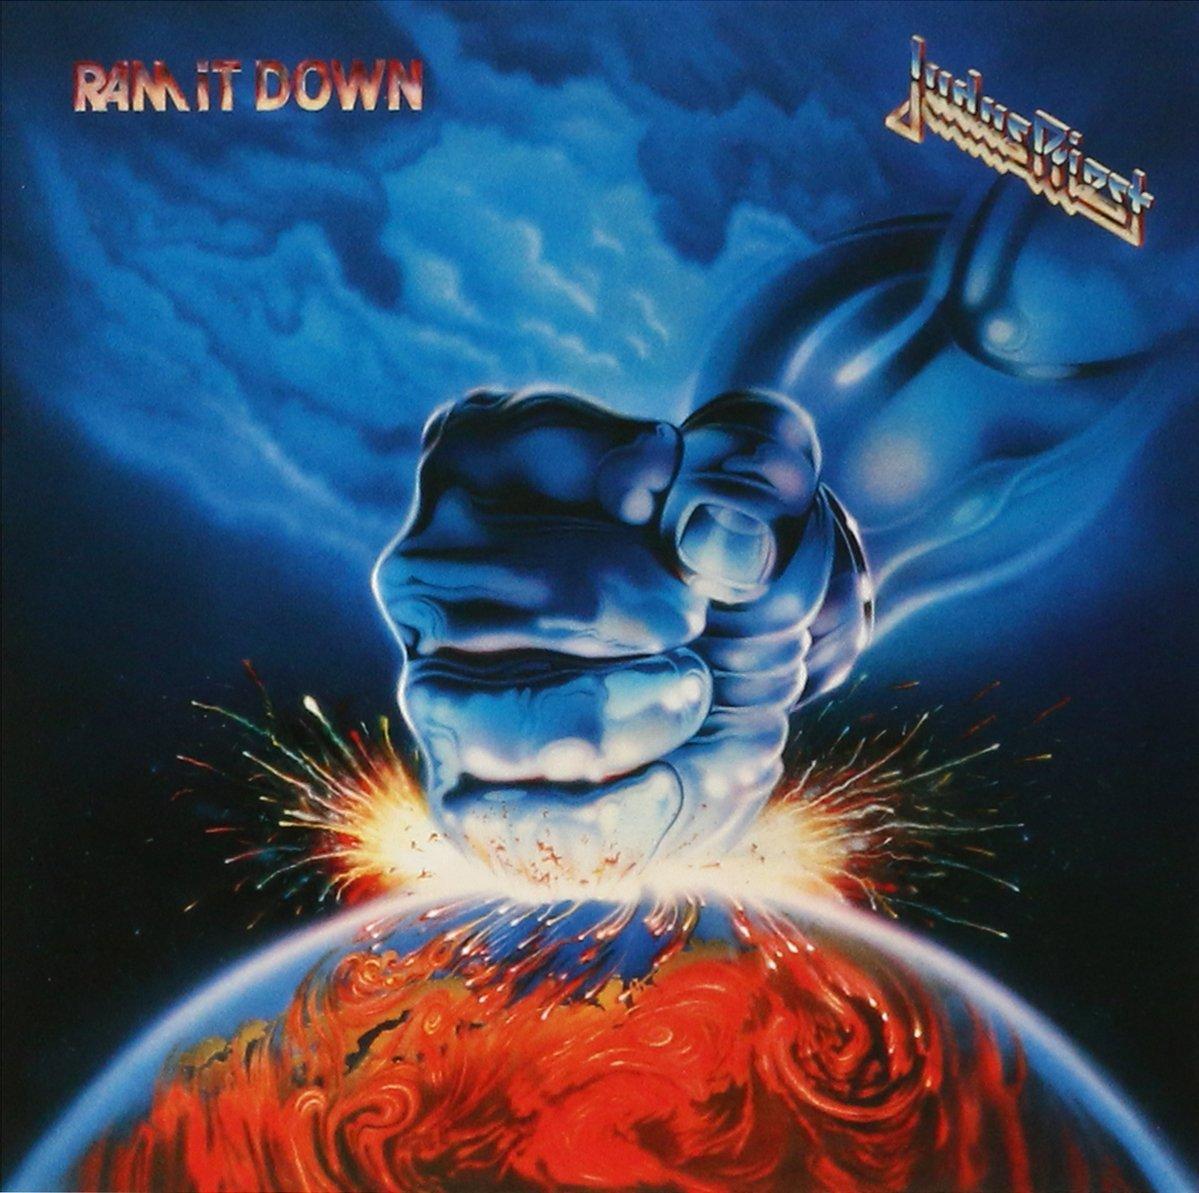 Judas Priest - The Complete Albums Collection - Amazon.com Music